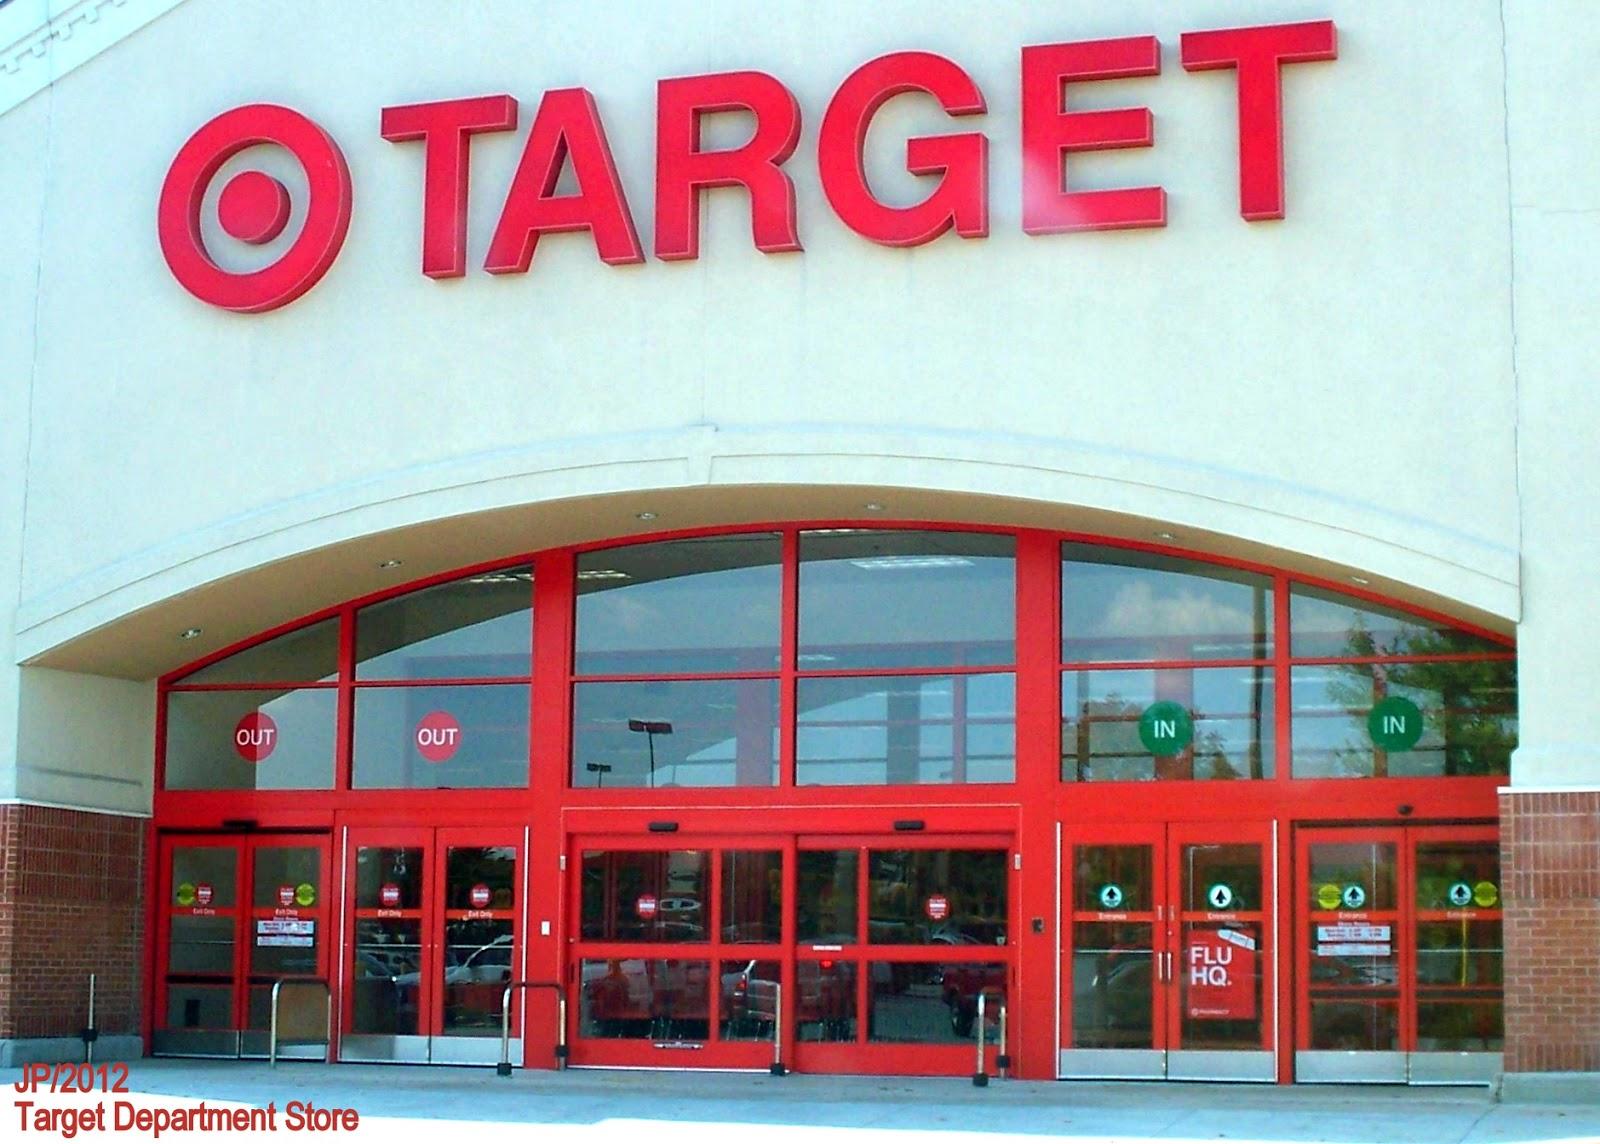 SUPER TARGET JACKSONVILLE FLORIDA Target Department Store Grocery Super Market Jacksonville Florida